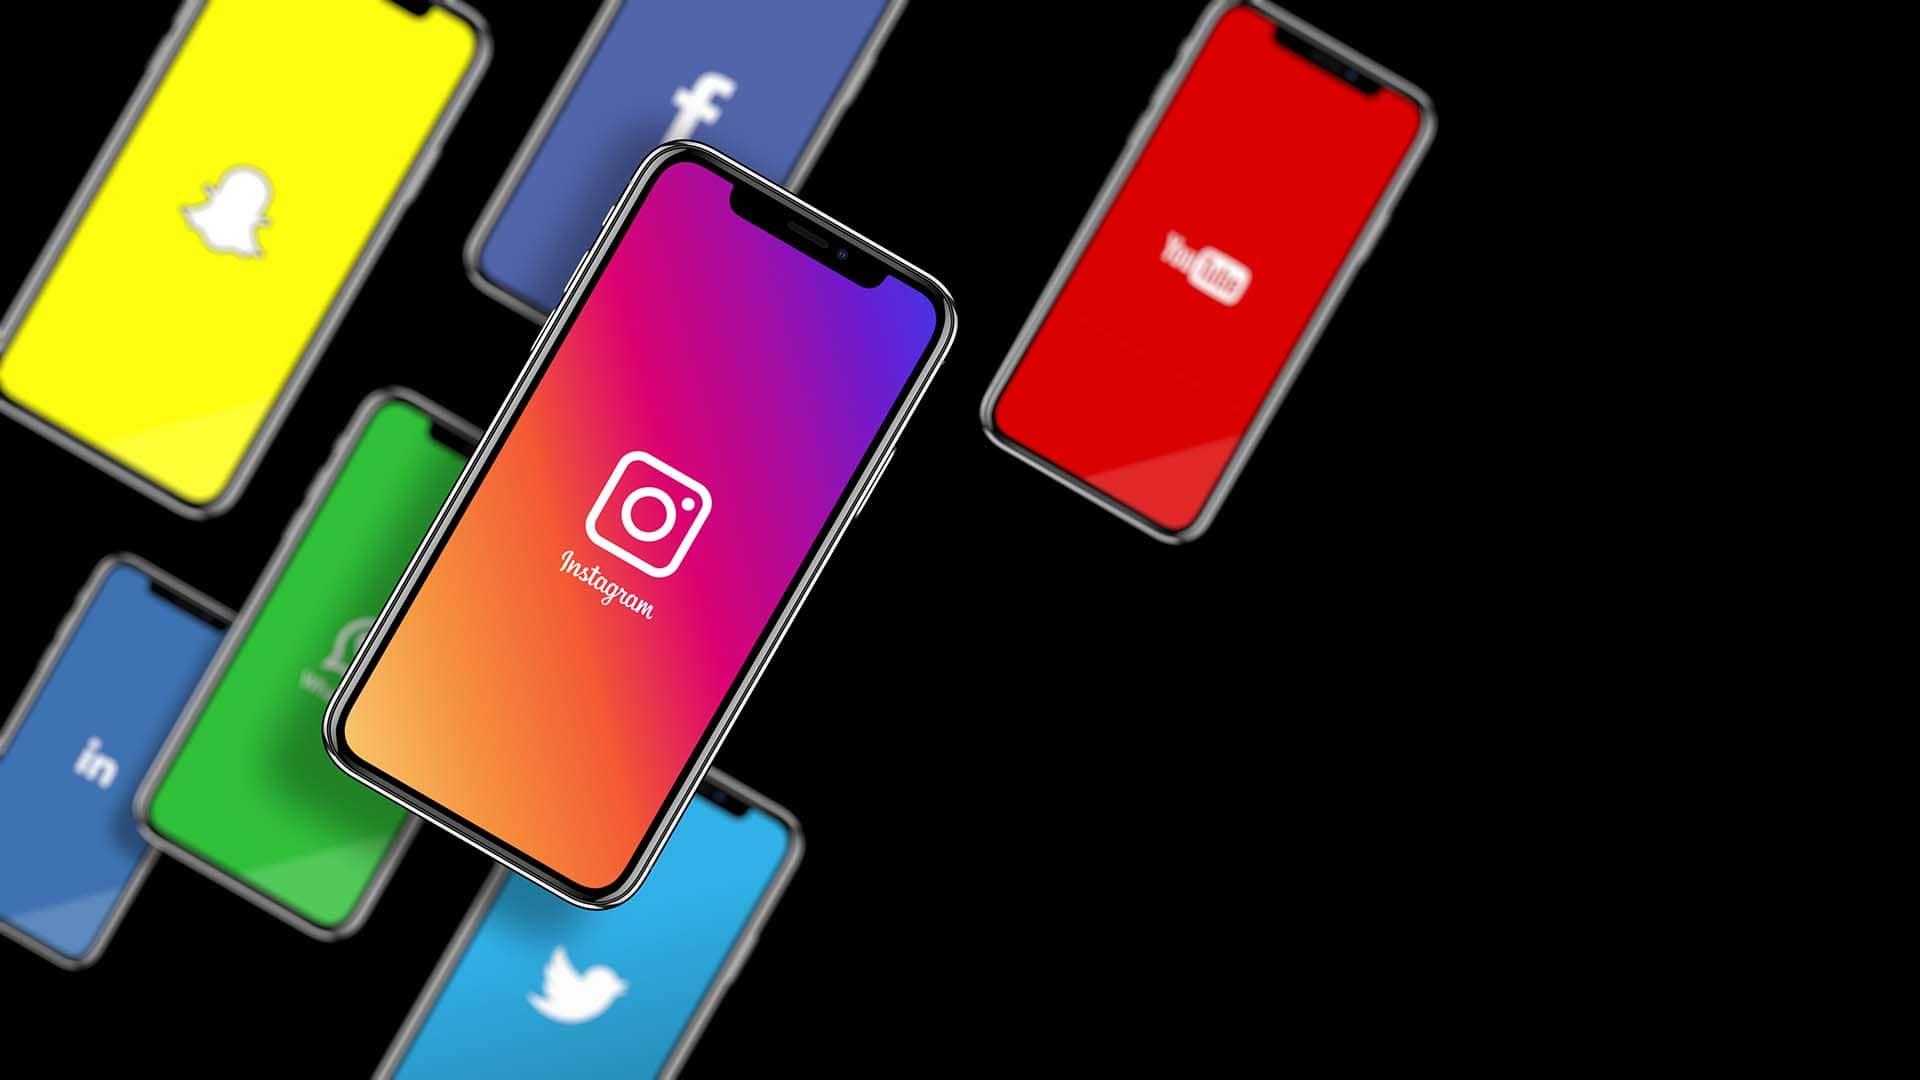 infinidad social media iphones